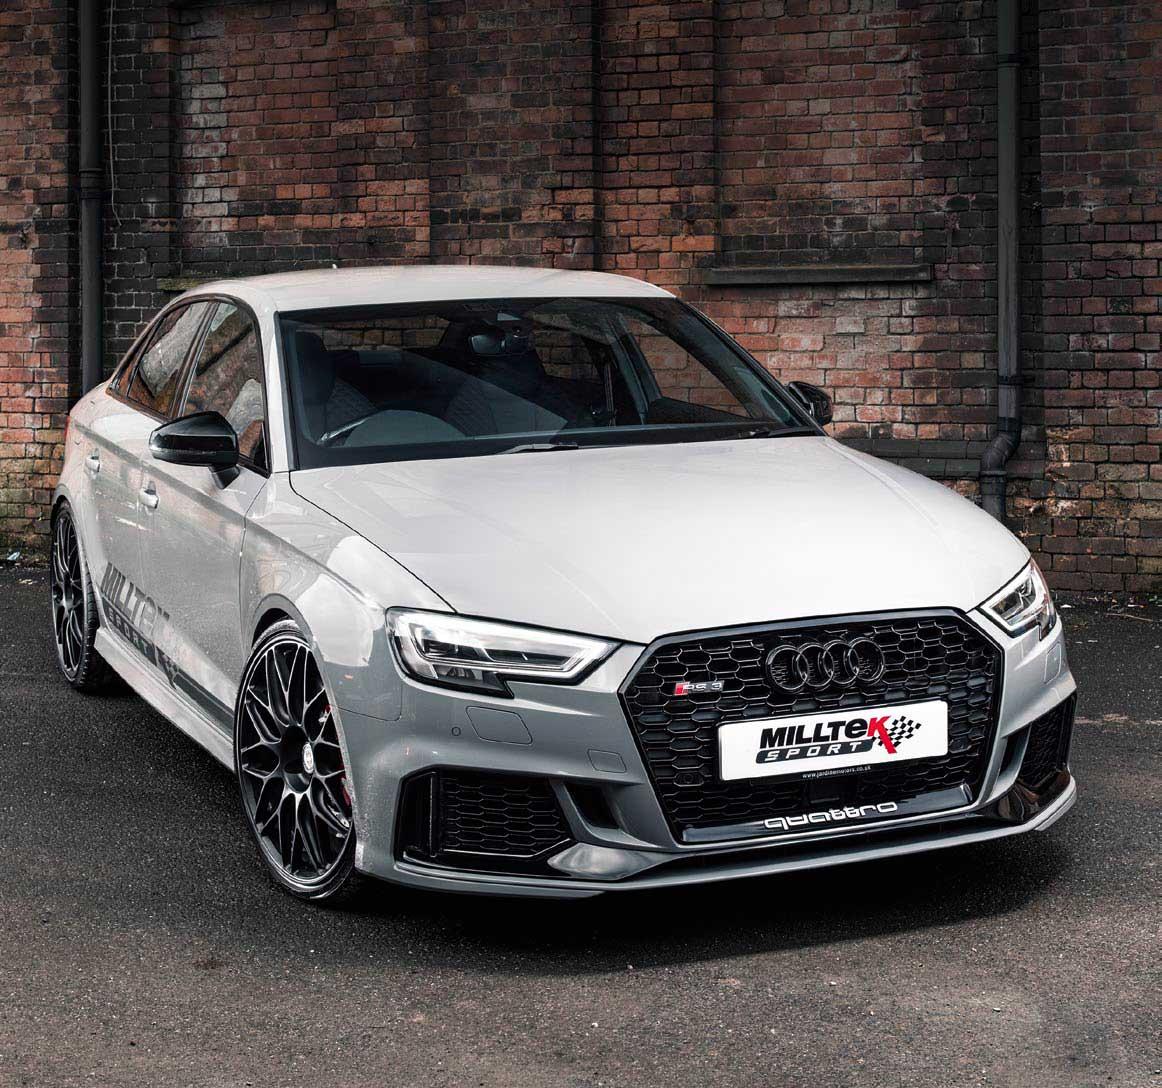 2018 Milltek Sport My17 Audi Rs3 8v Saloon Drive My Blogs Drive